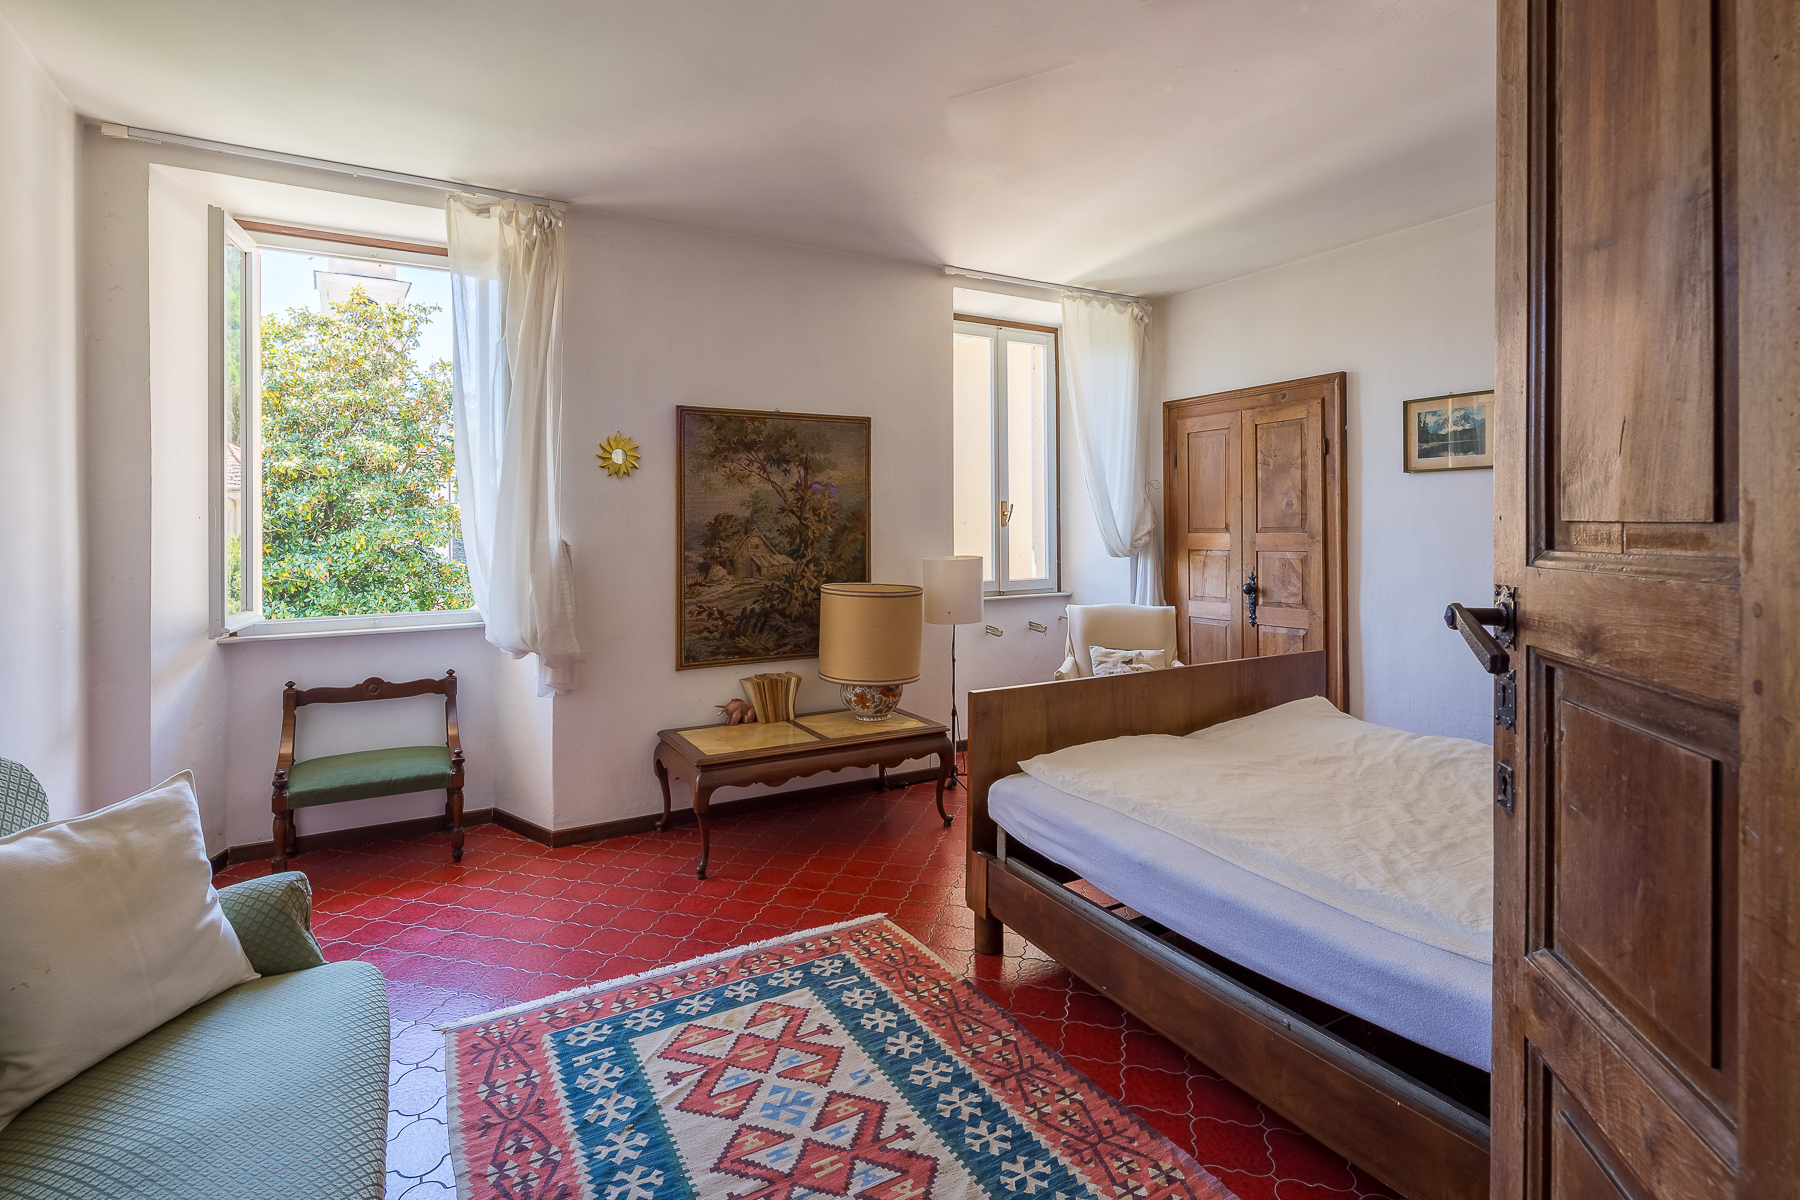 Casa indipendente in Vendita a Pella: 5 locali, 292 mq - Foto 10